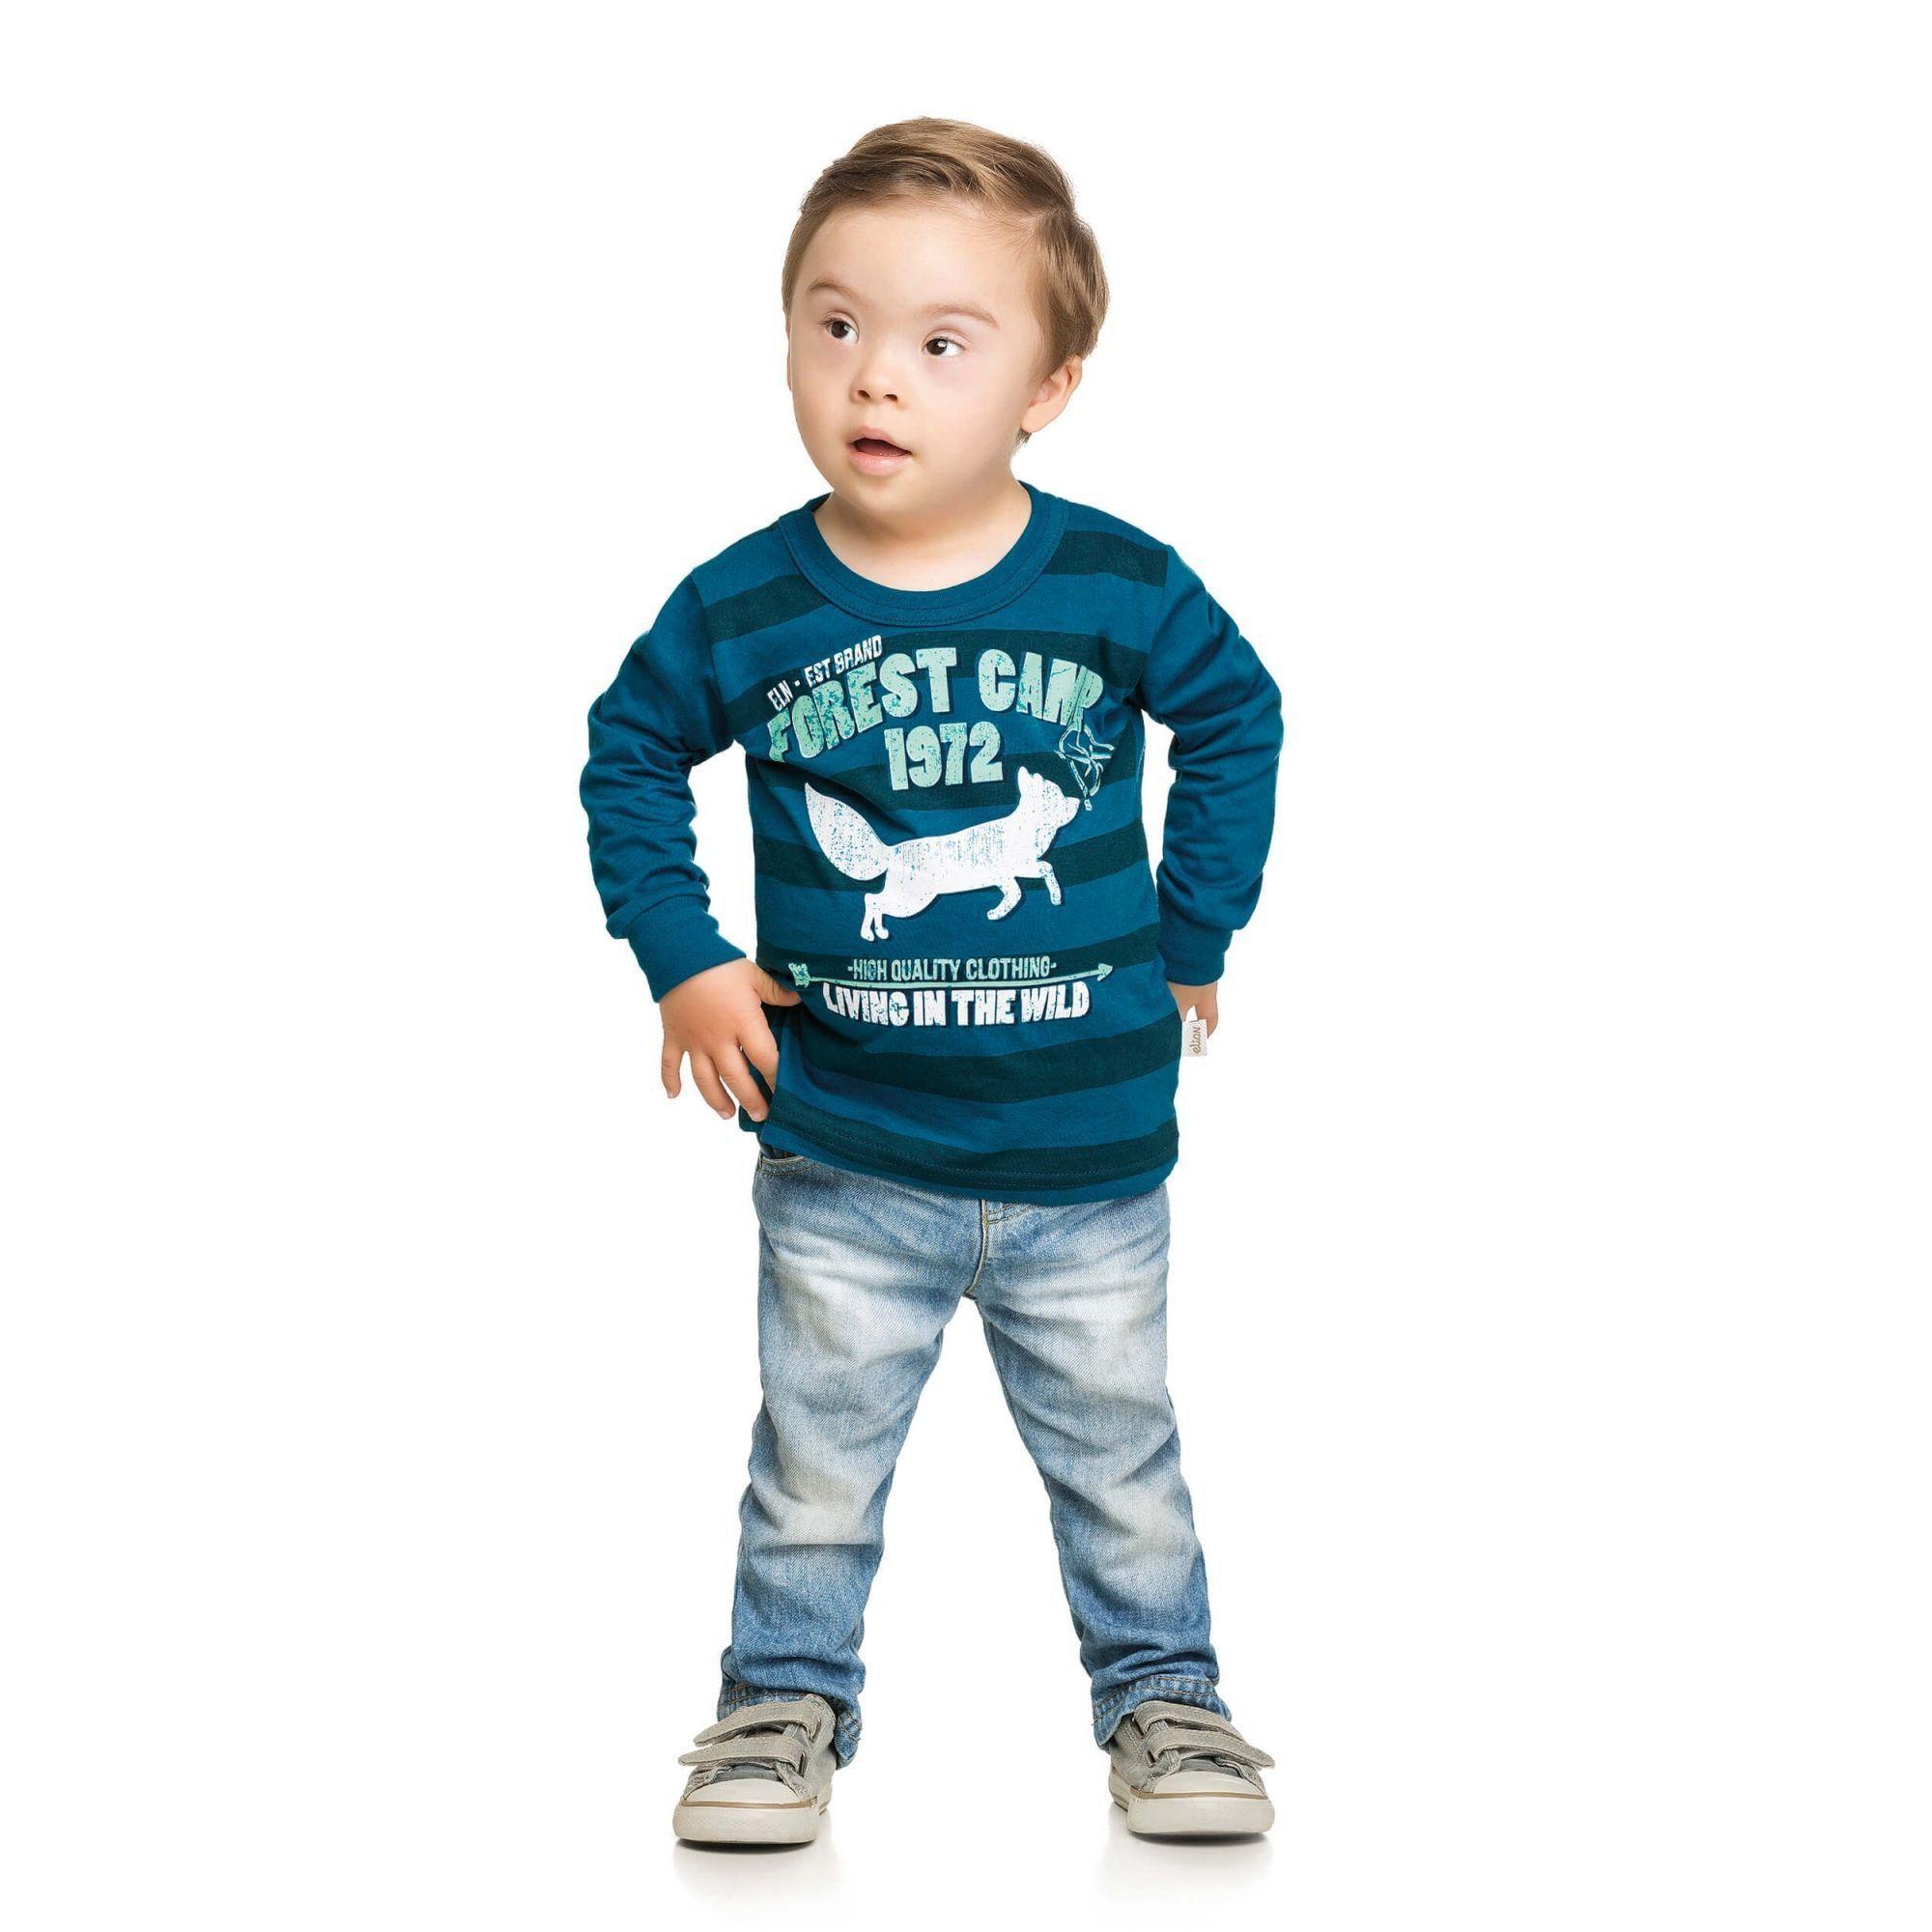 Camiseta Infantil Masculina Inverno Azul Forest Camp Elian